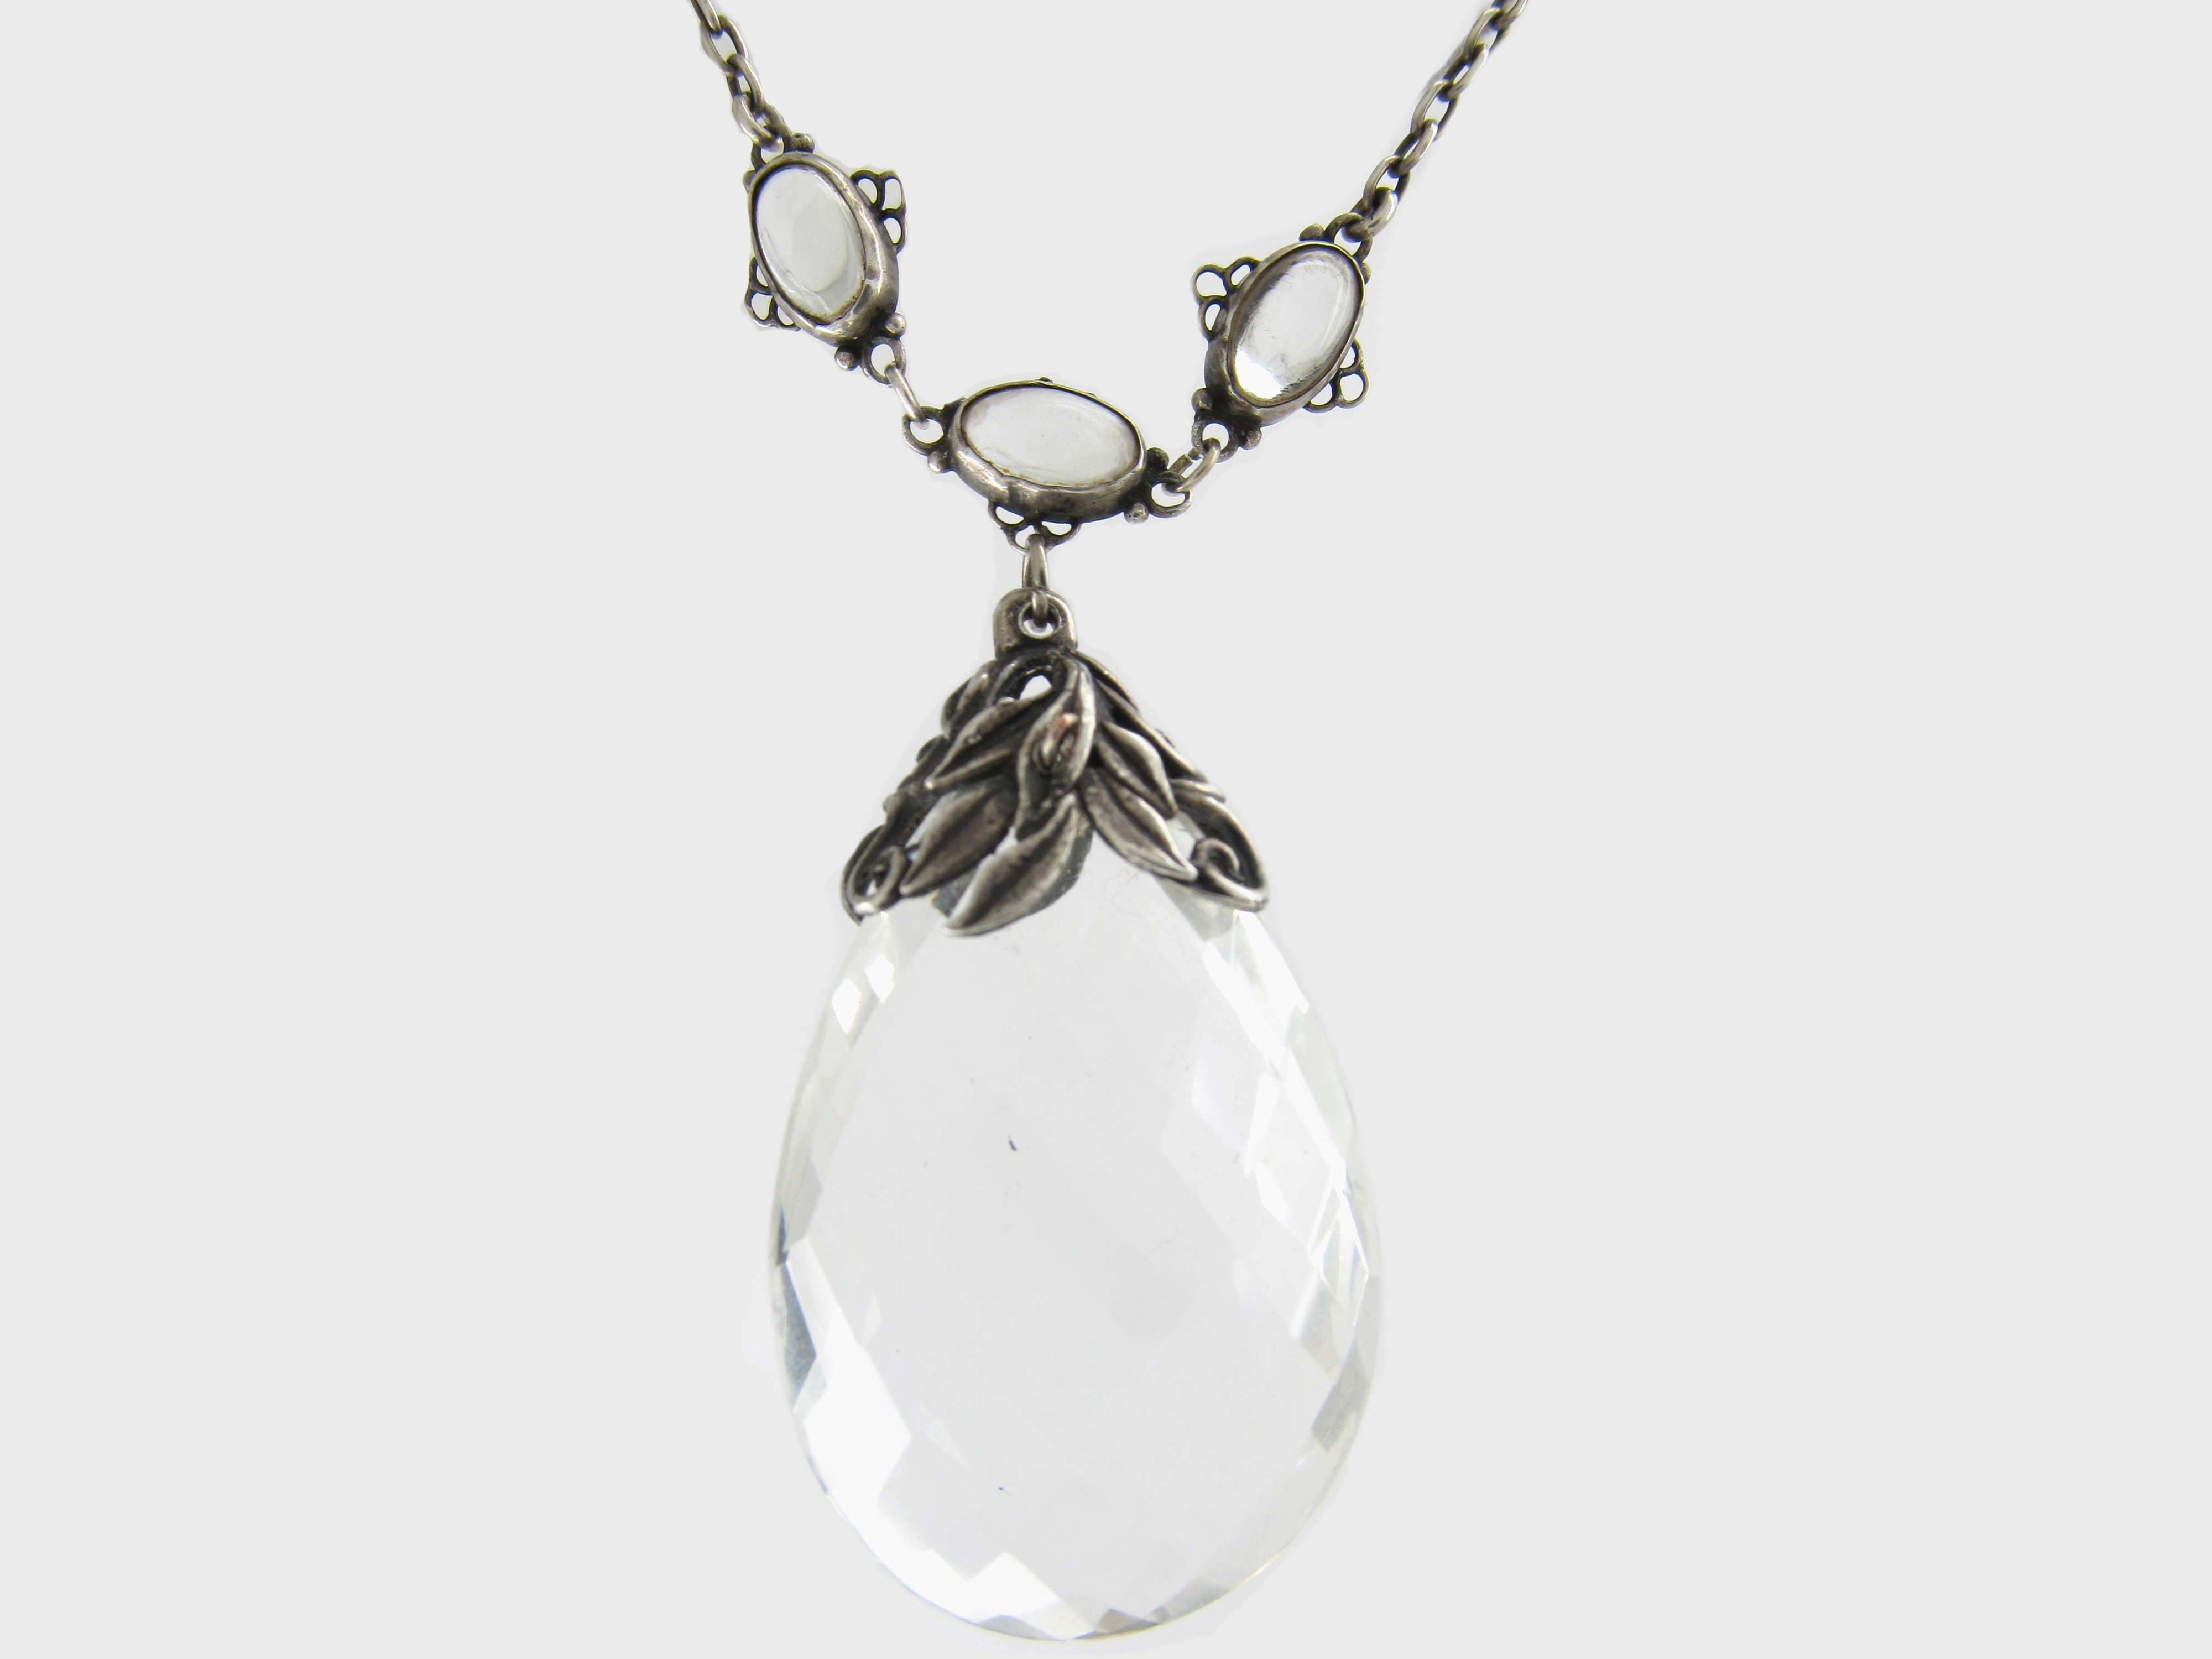 Arts & Crafts Rock Crystal & Silver Long Pendant Necklace by Bernard Instone